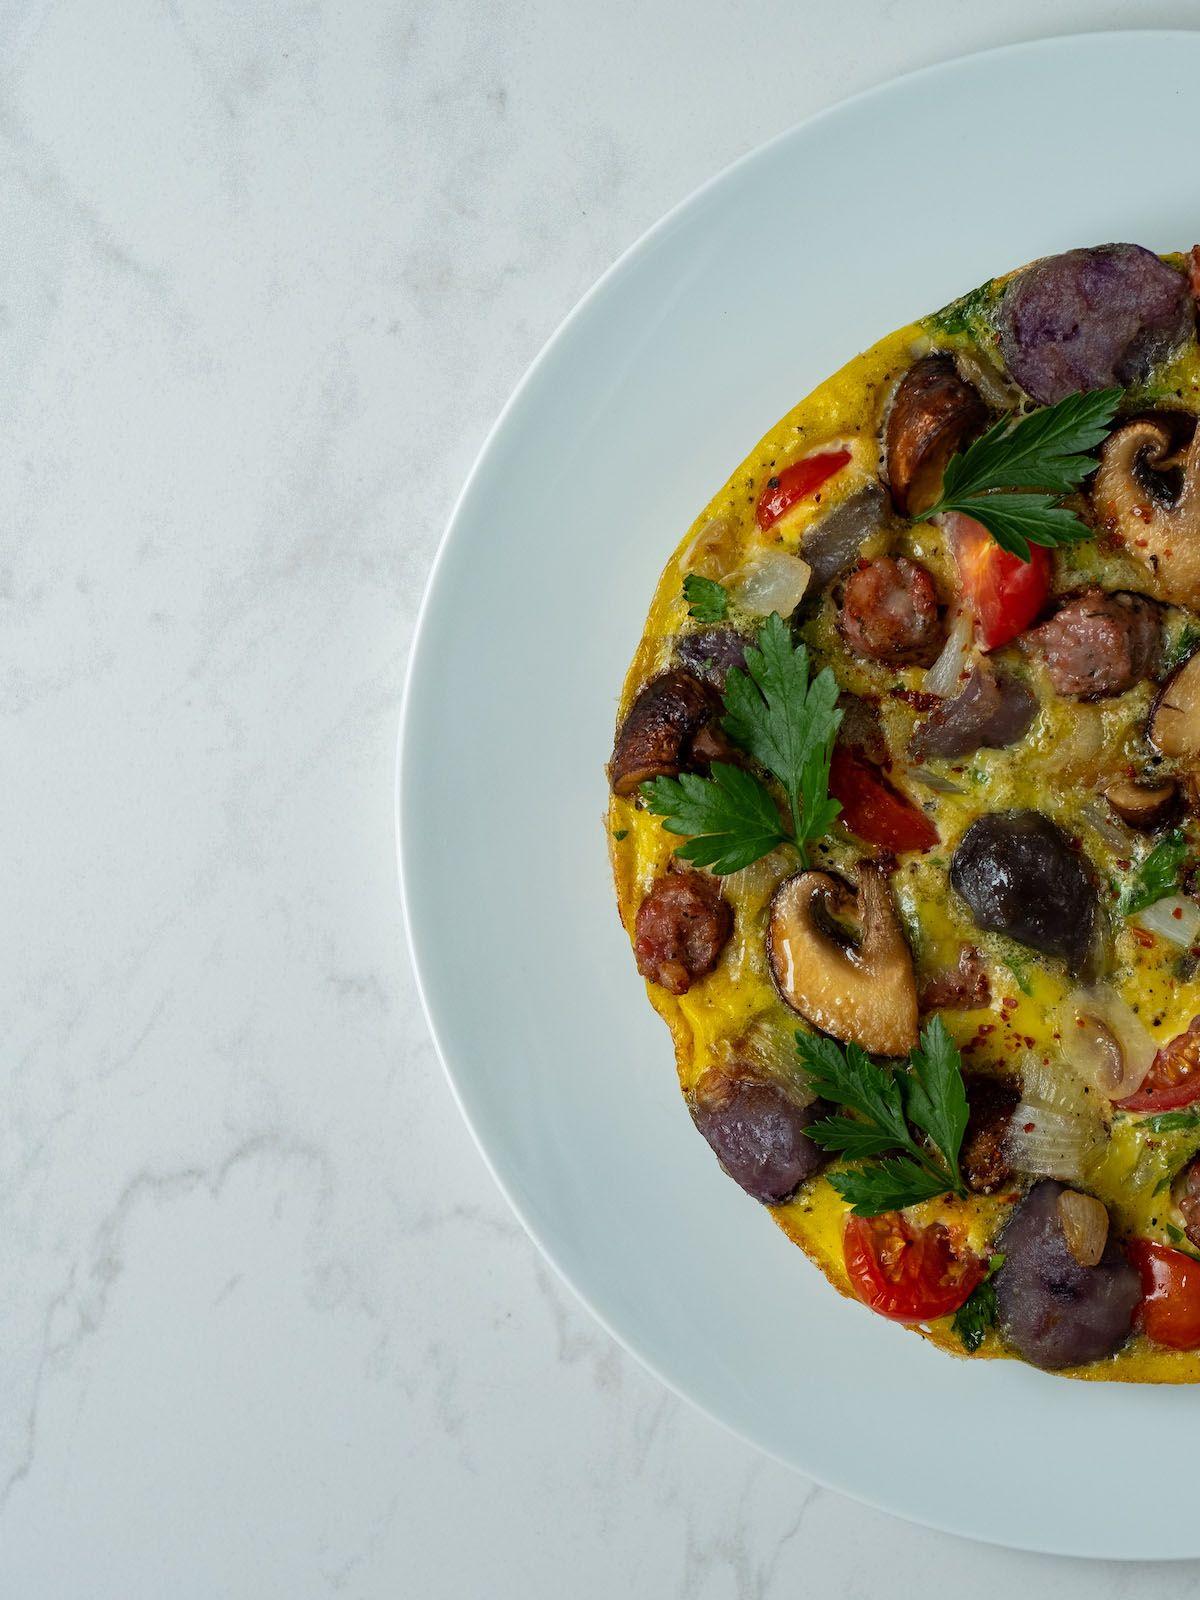 About Fuel, Foodblog, Rezept, Tortilla, Champignons